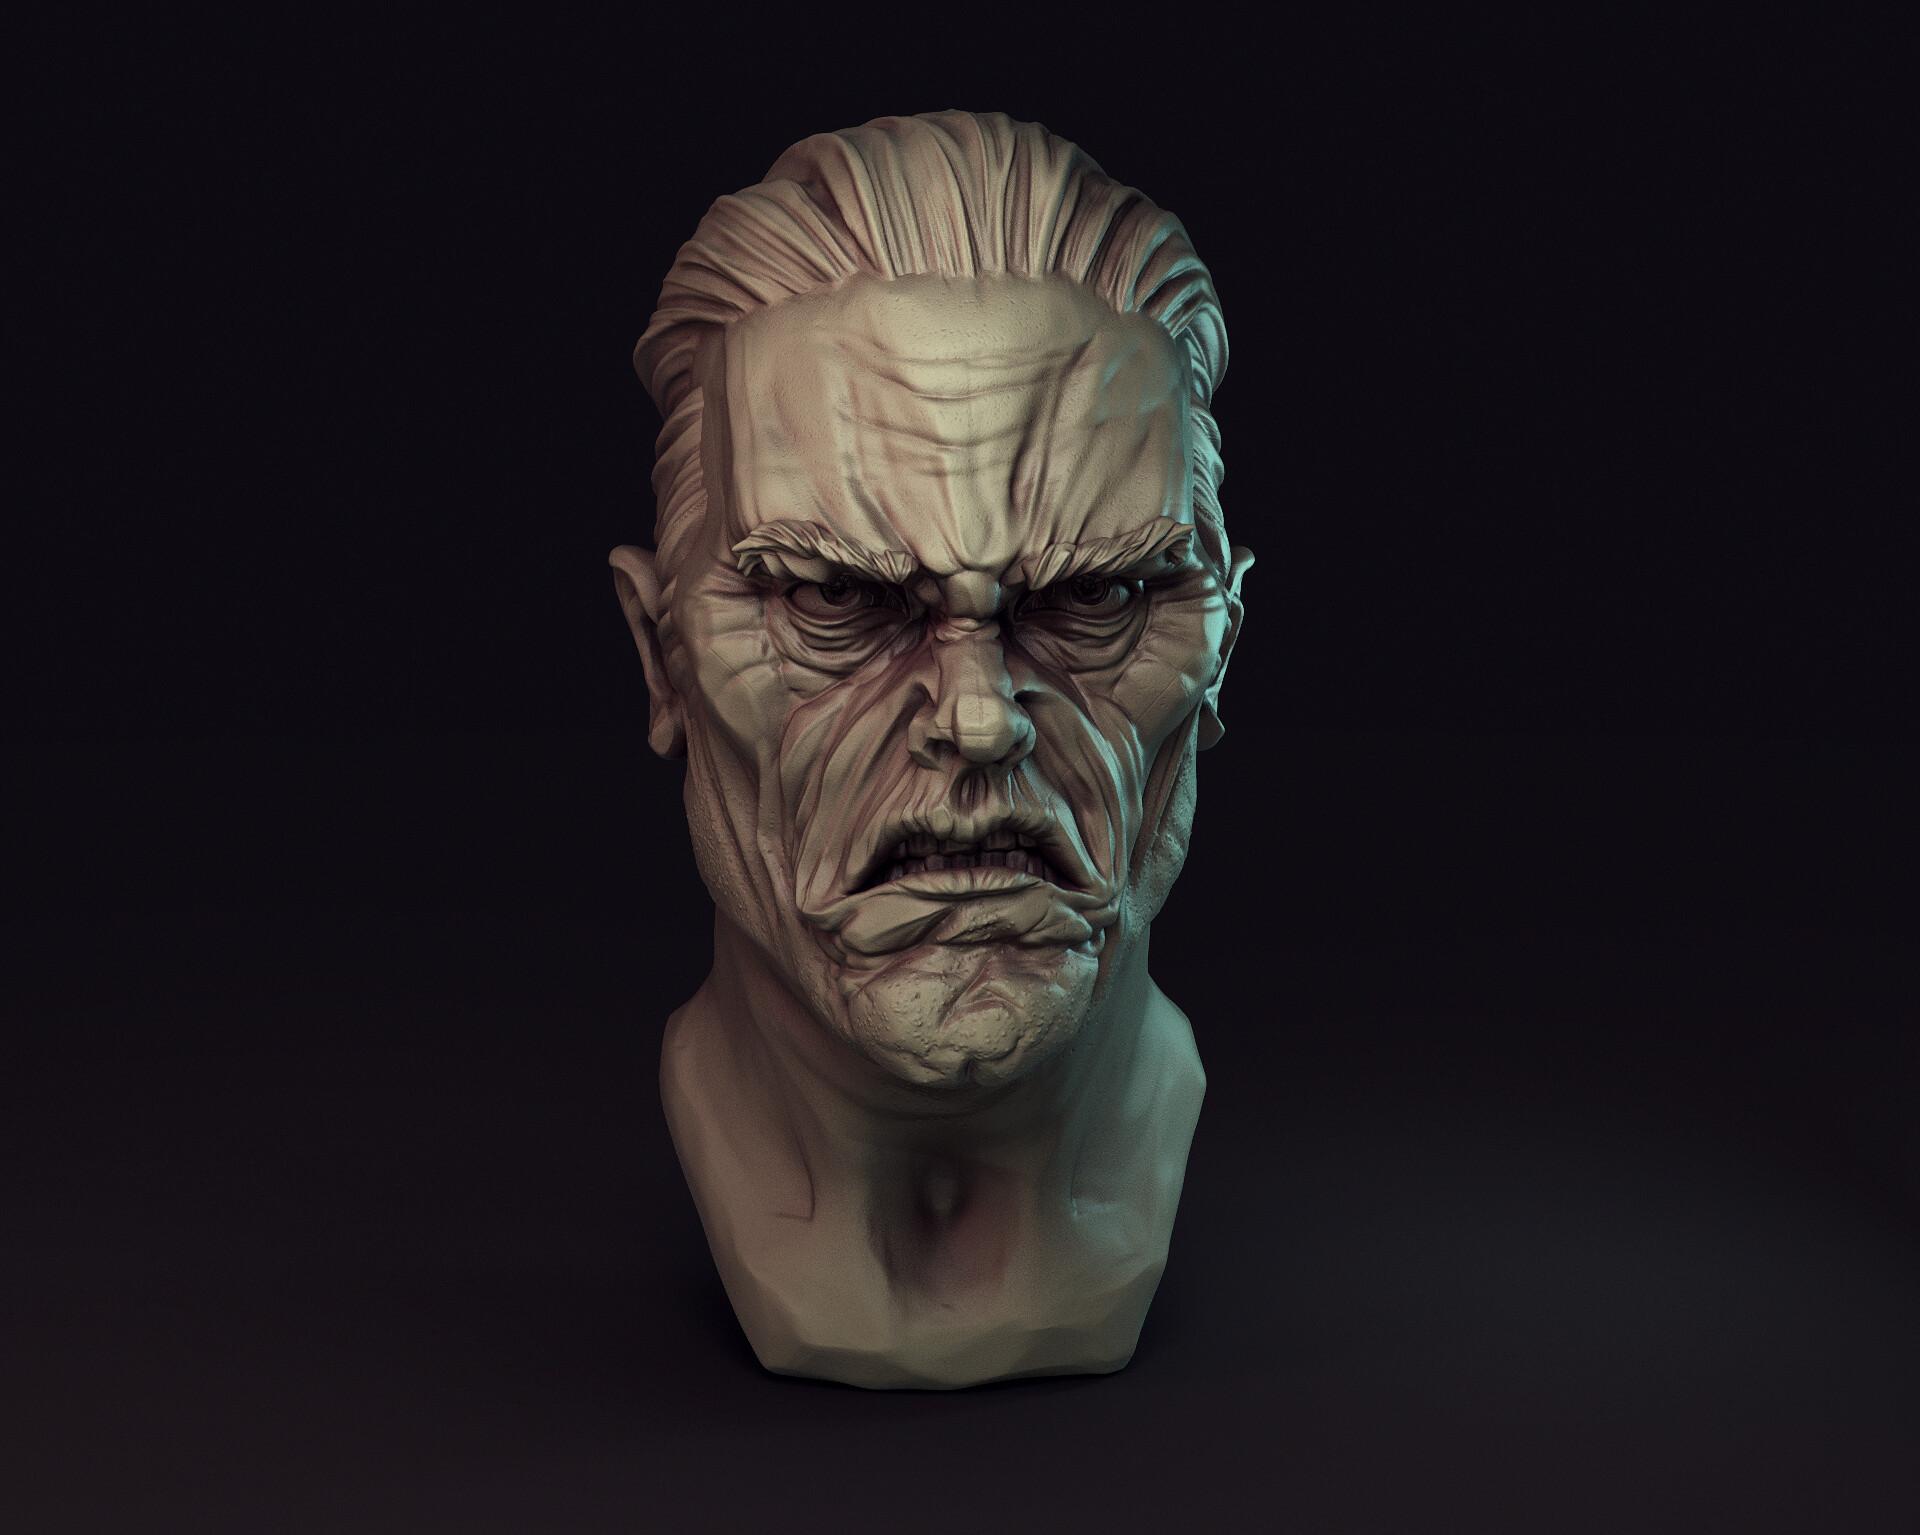 Artem bespalov angry dude artstation03